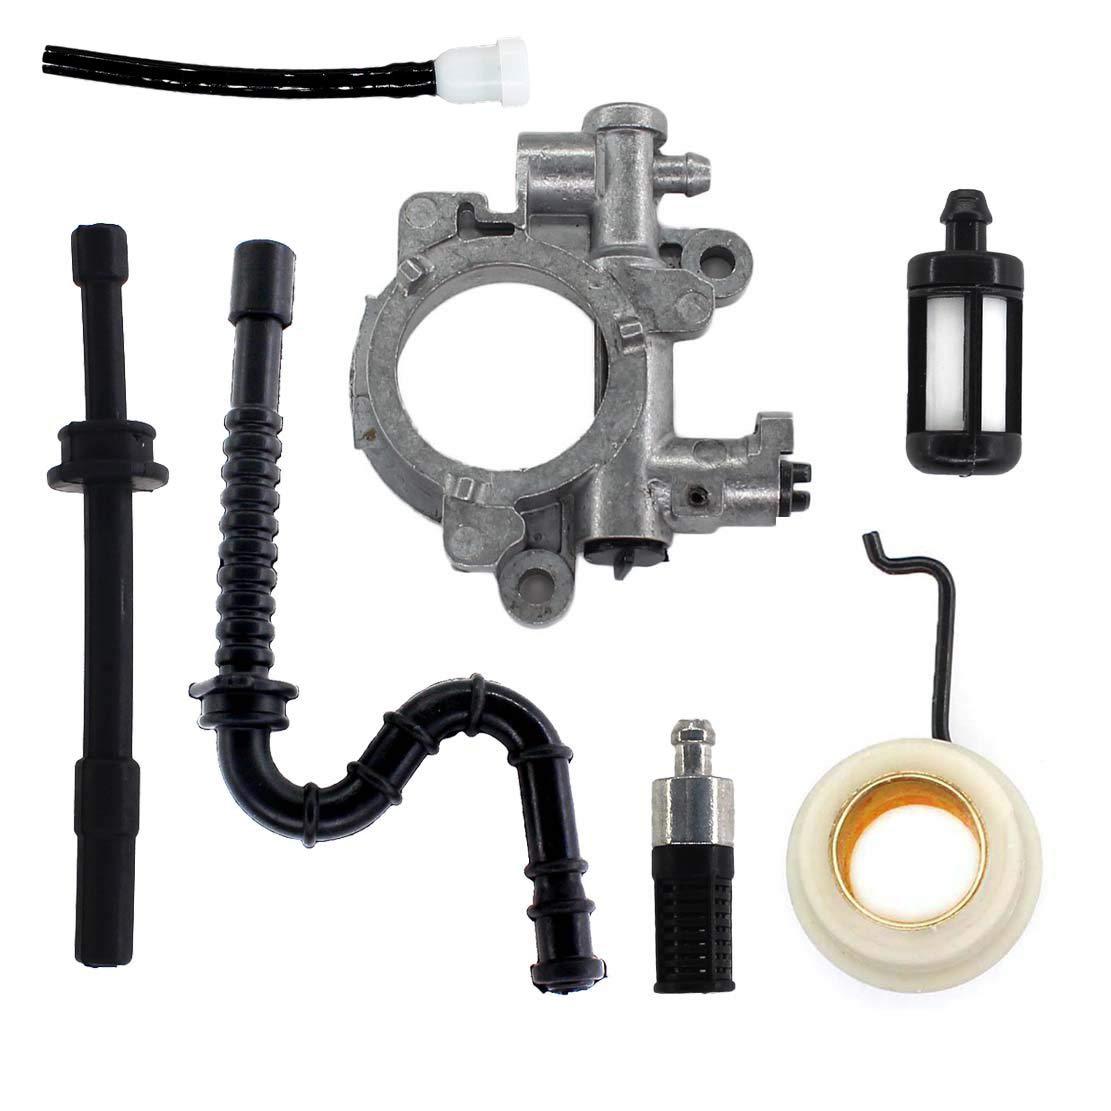 USPEEDA Oil Pump Oiler & Worm Gear Spring for Stihl 029 039 MS290 MS310 MS390 MS311 MS391 by USPEEDA